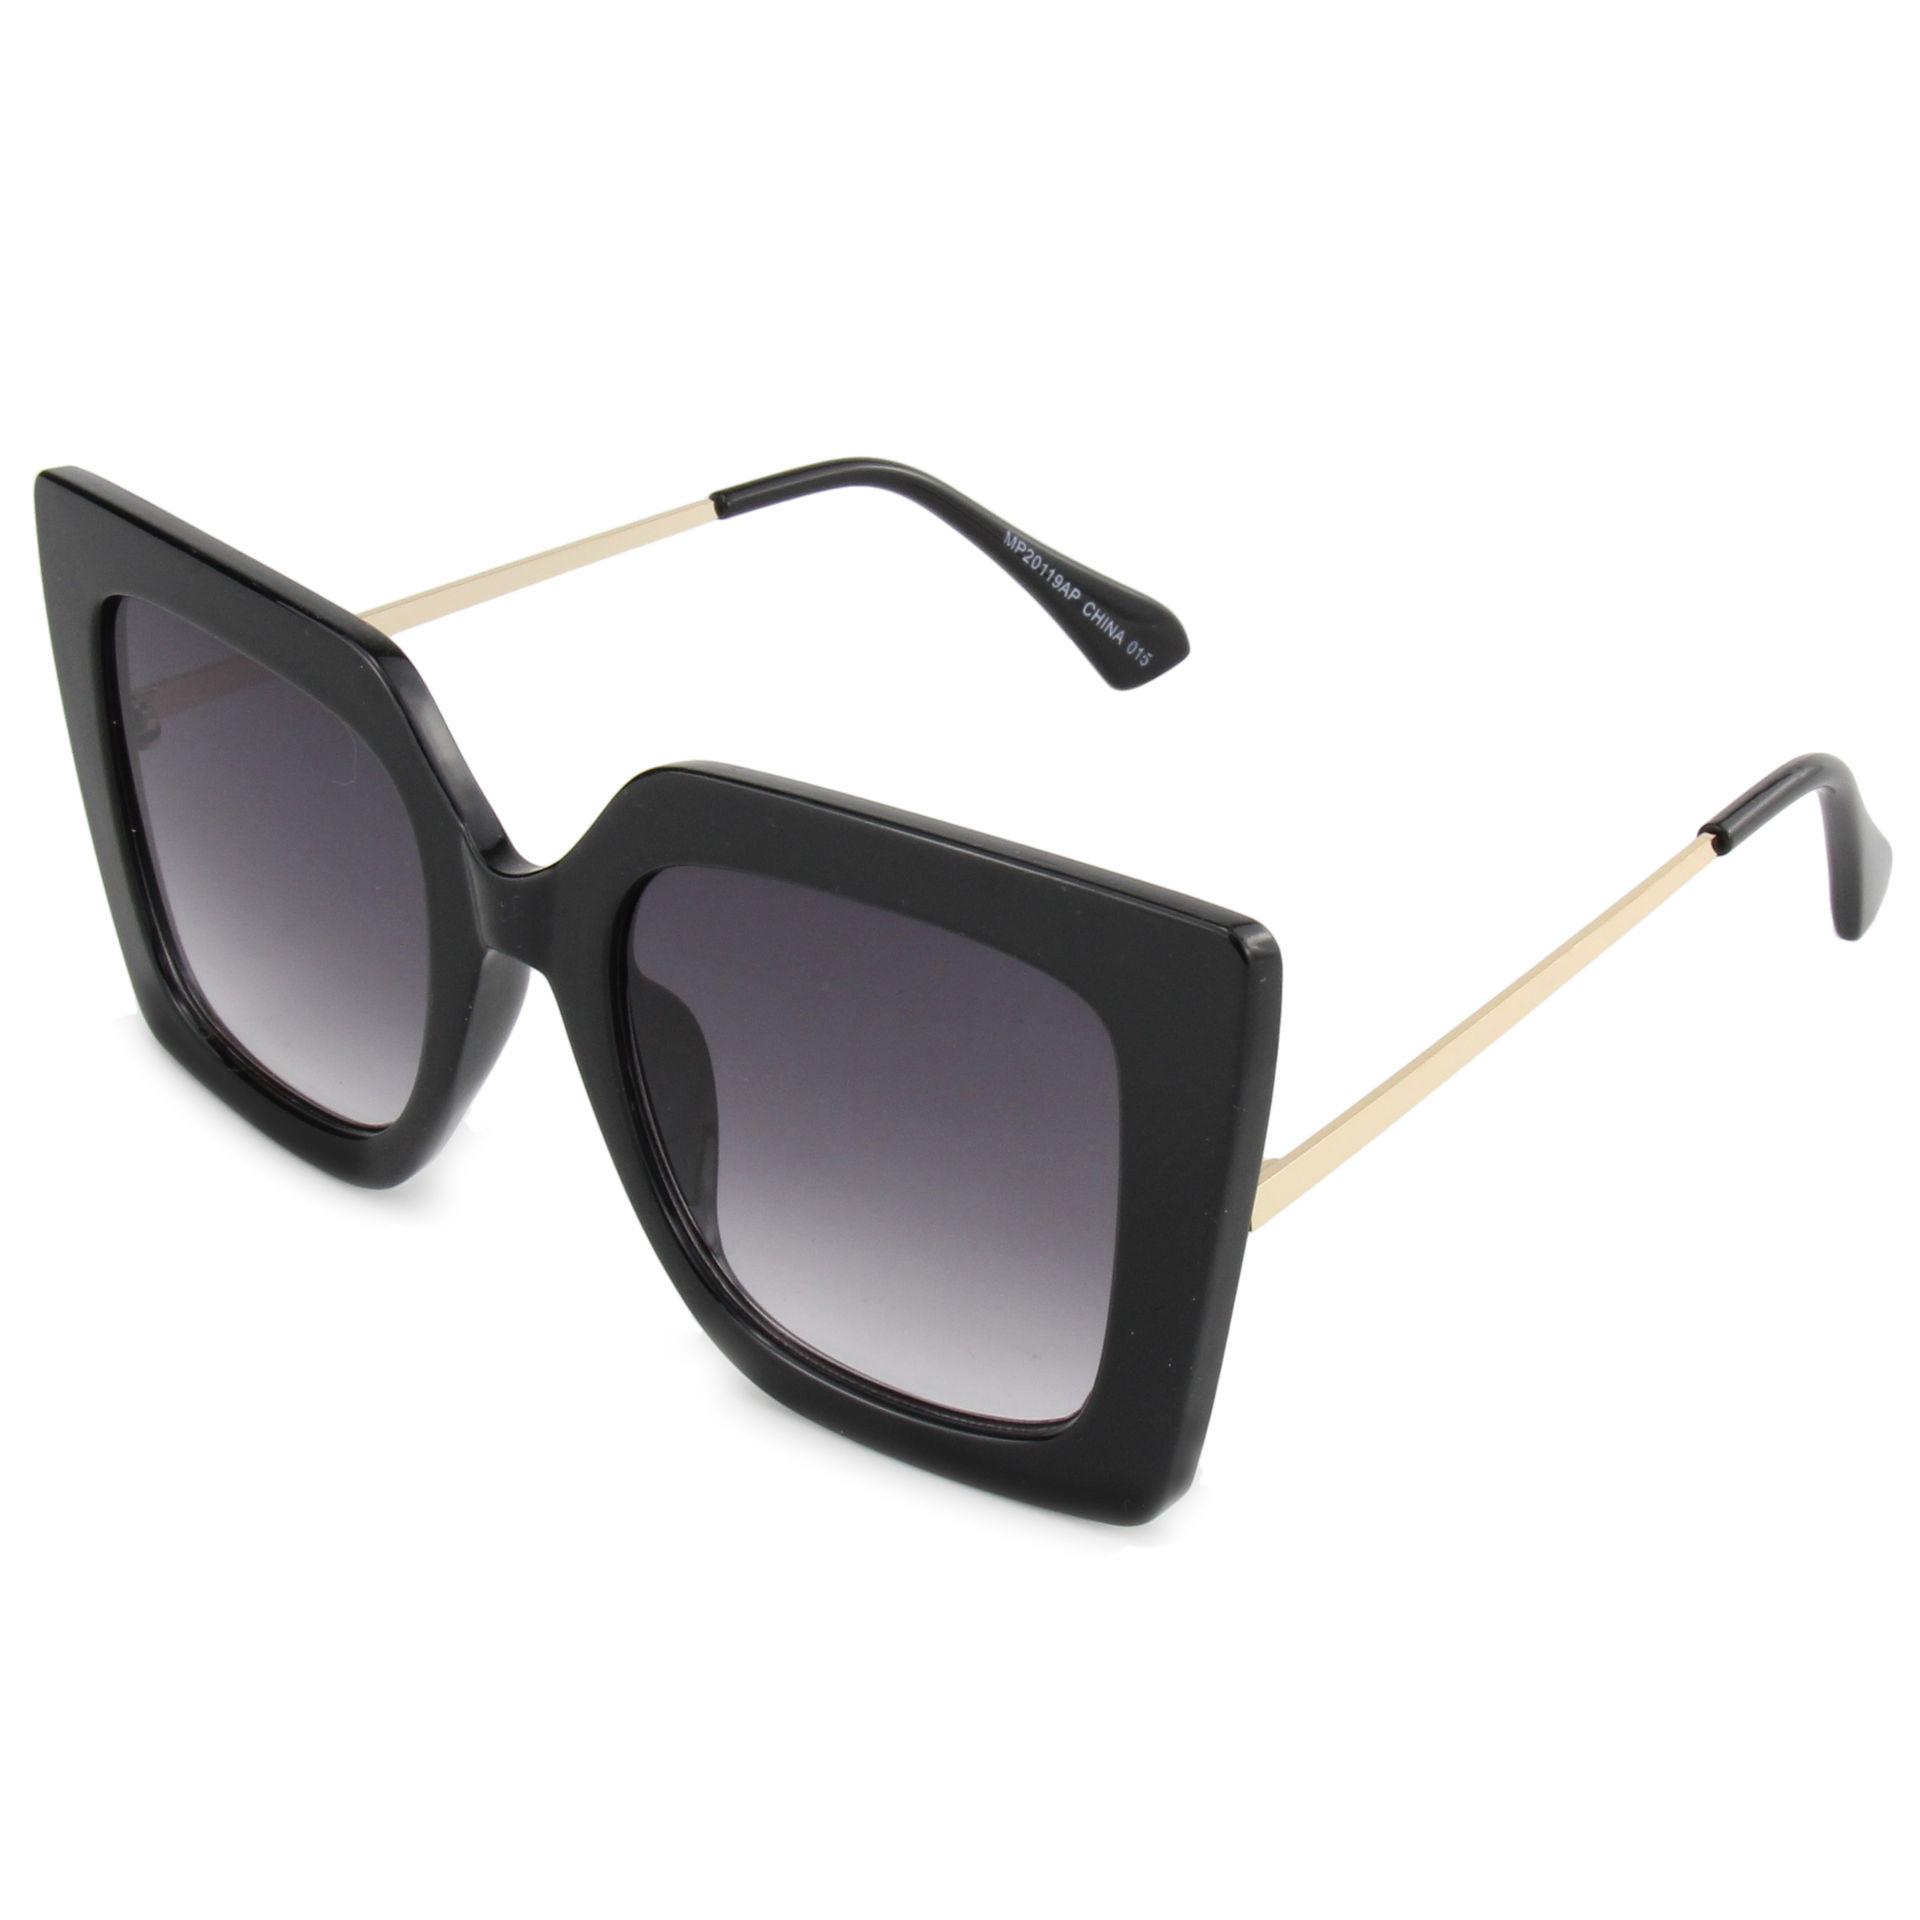 EUGENIA New fashion square sunglasses women high quality shade pc metal sunglasses 2020 2021